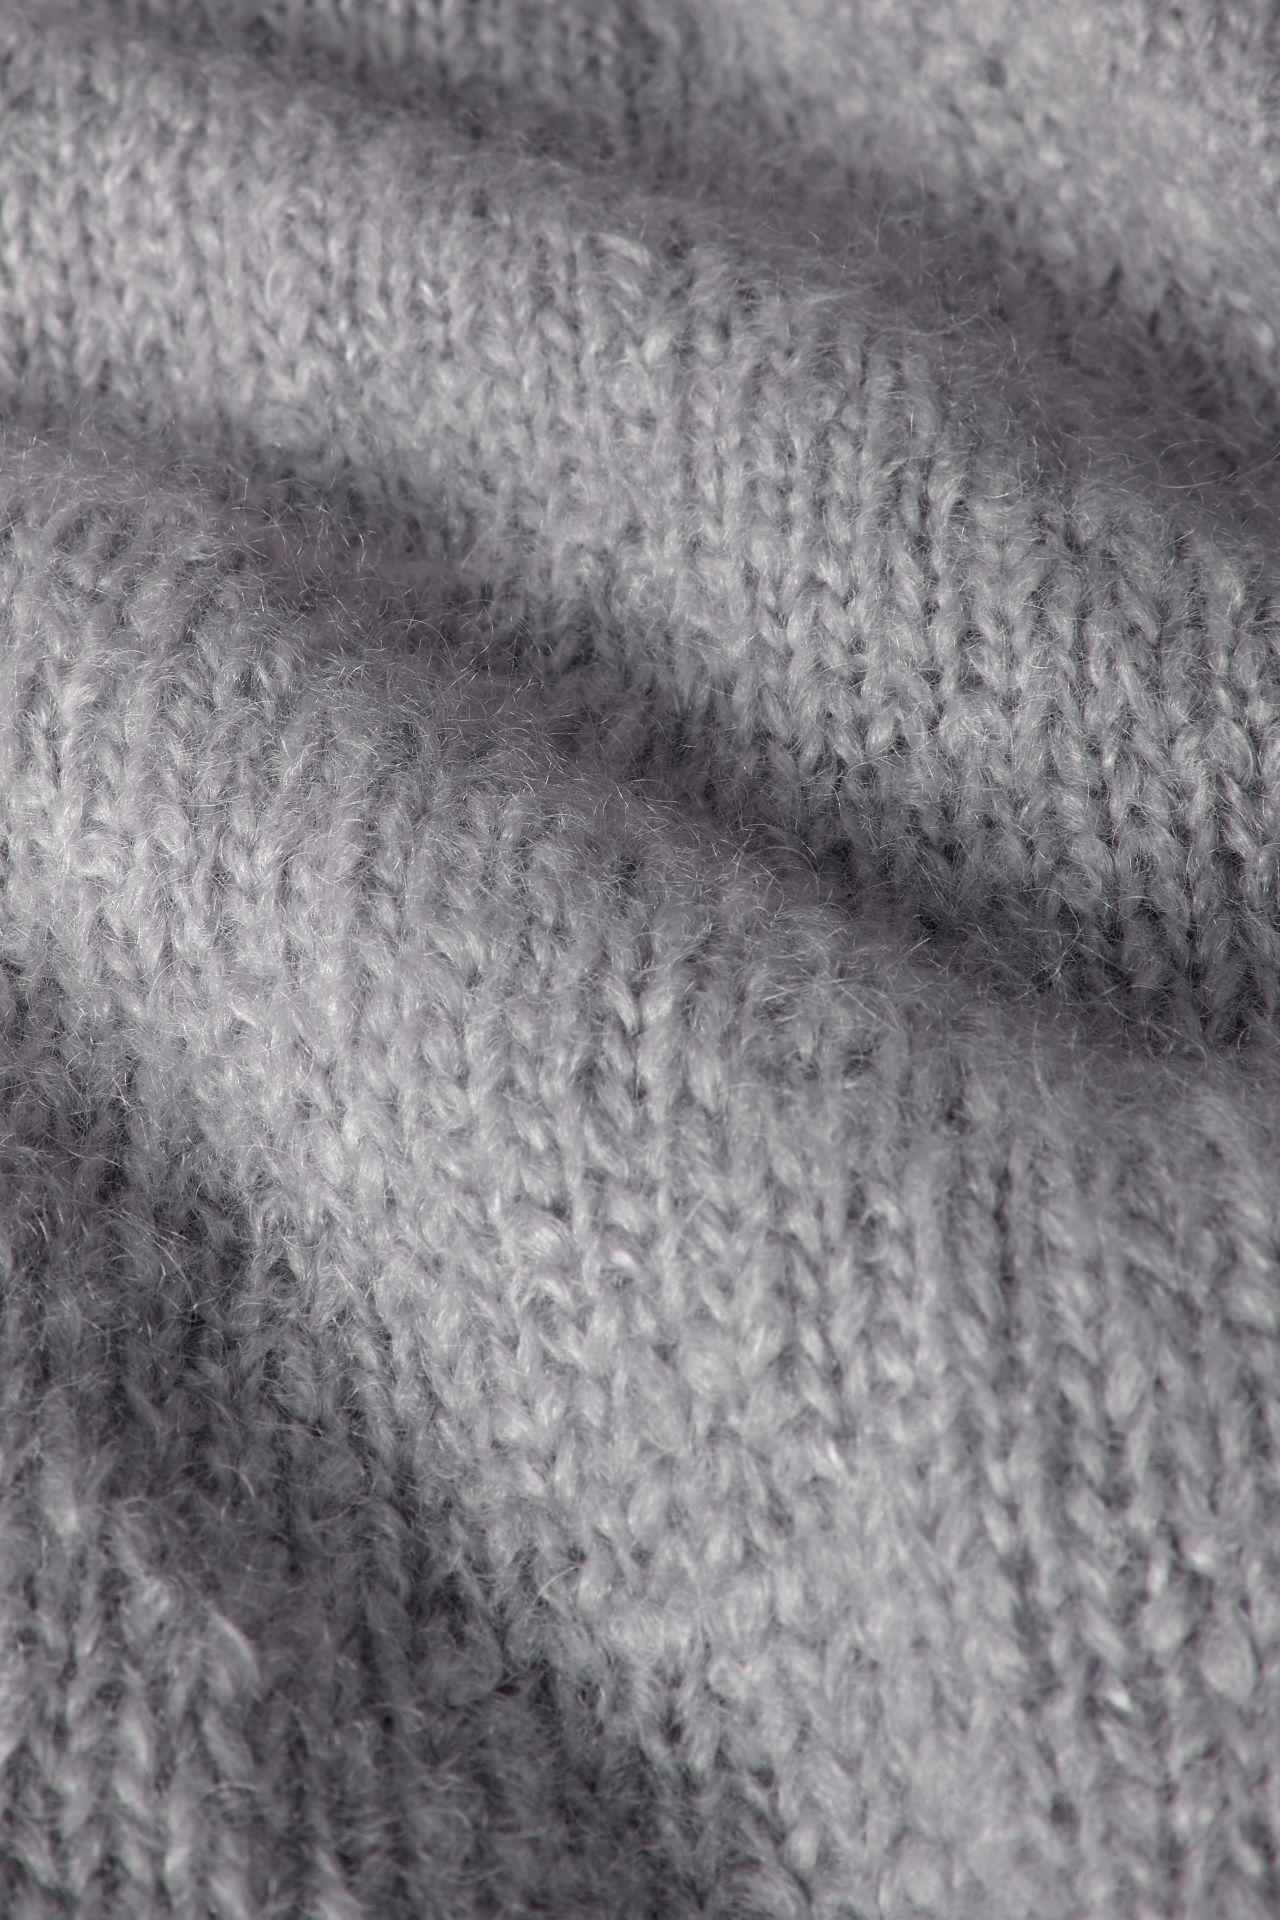 Mohair light gray knit detail.